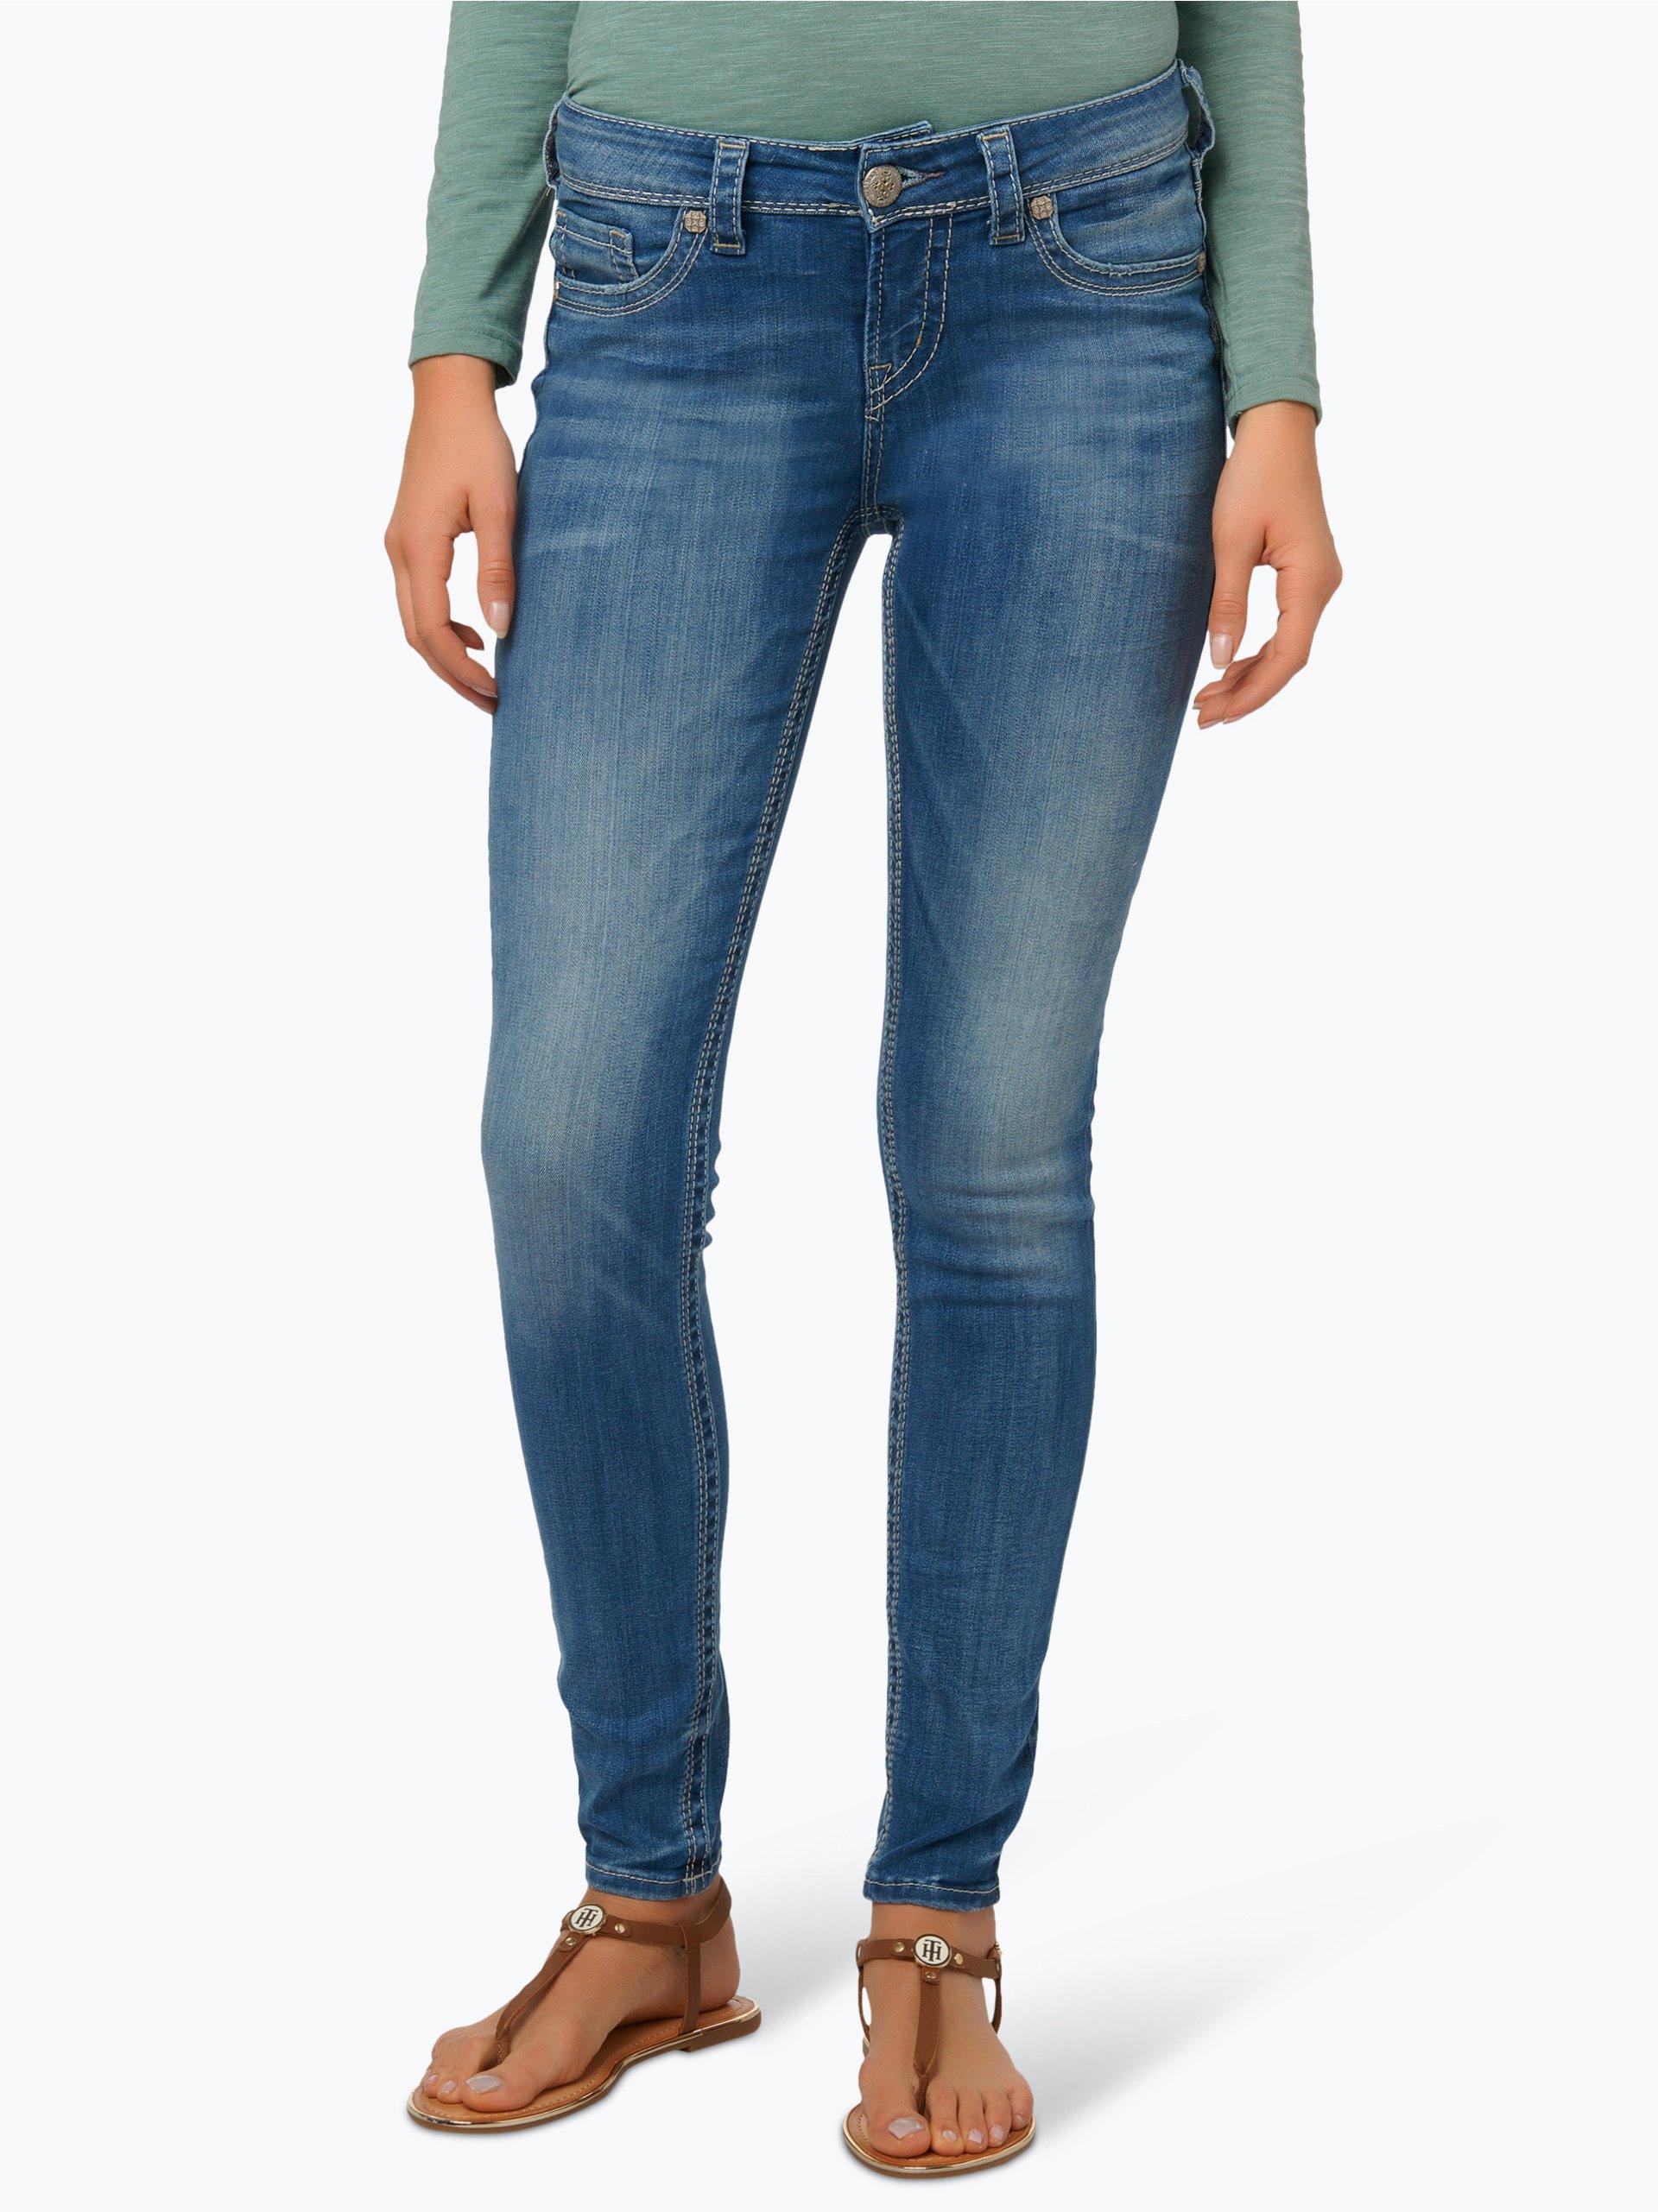 silver jeans damen jeans suki light stone uni online kaufen vangraaf com. Black Bedroom Furniture Sets. Home Design Ideas